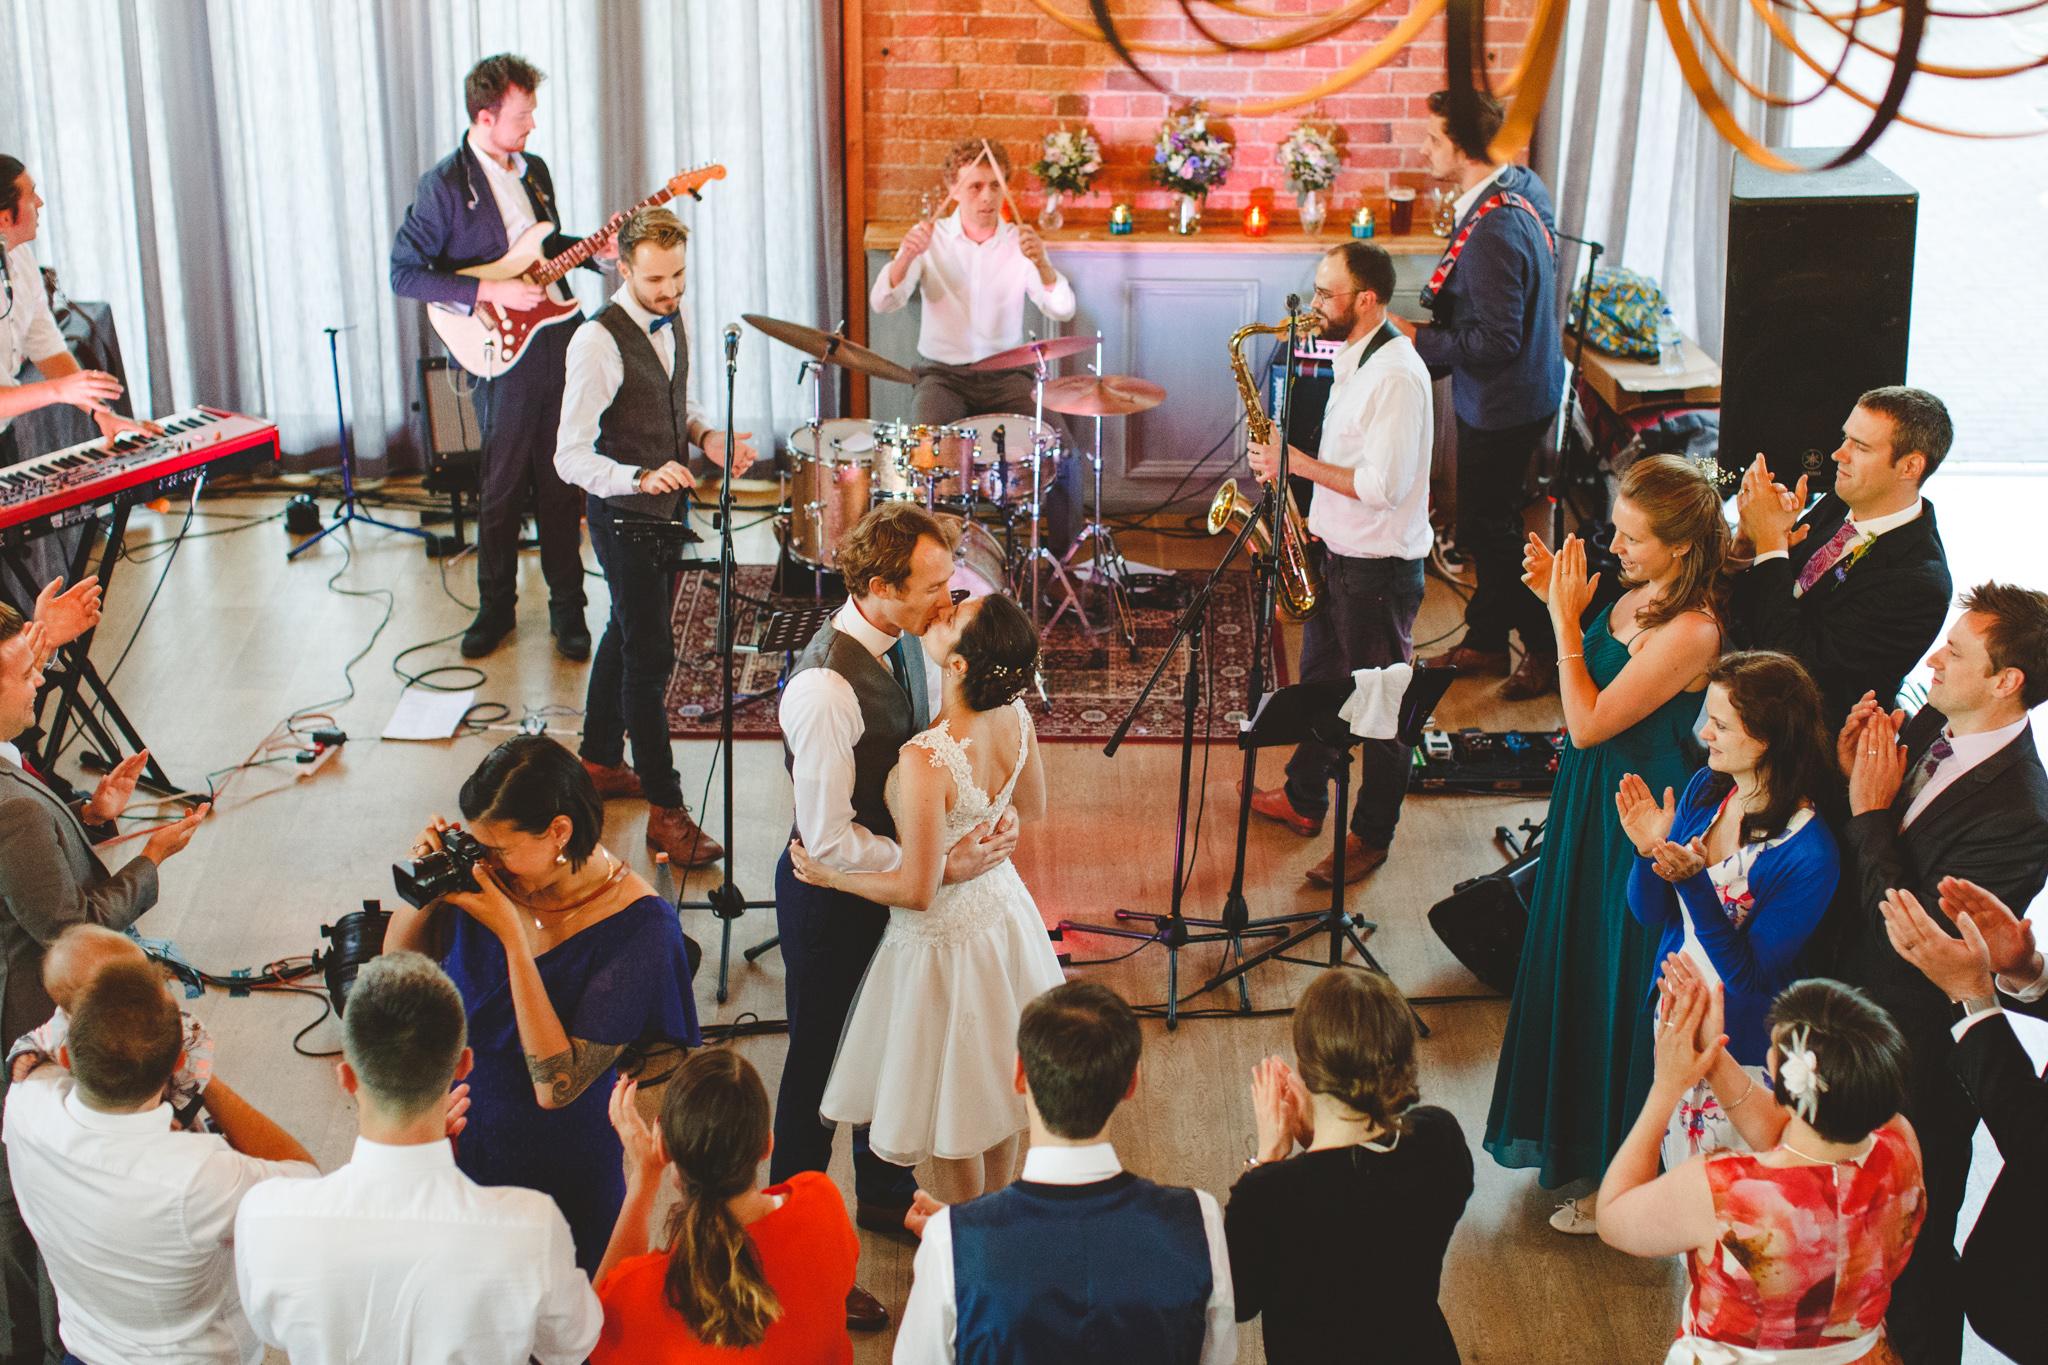 derbyshire-wedding-photographer-videographer-camera-hannah-4.jpg